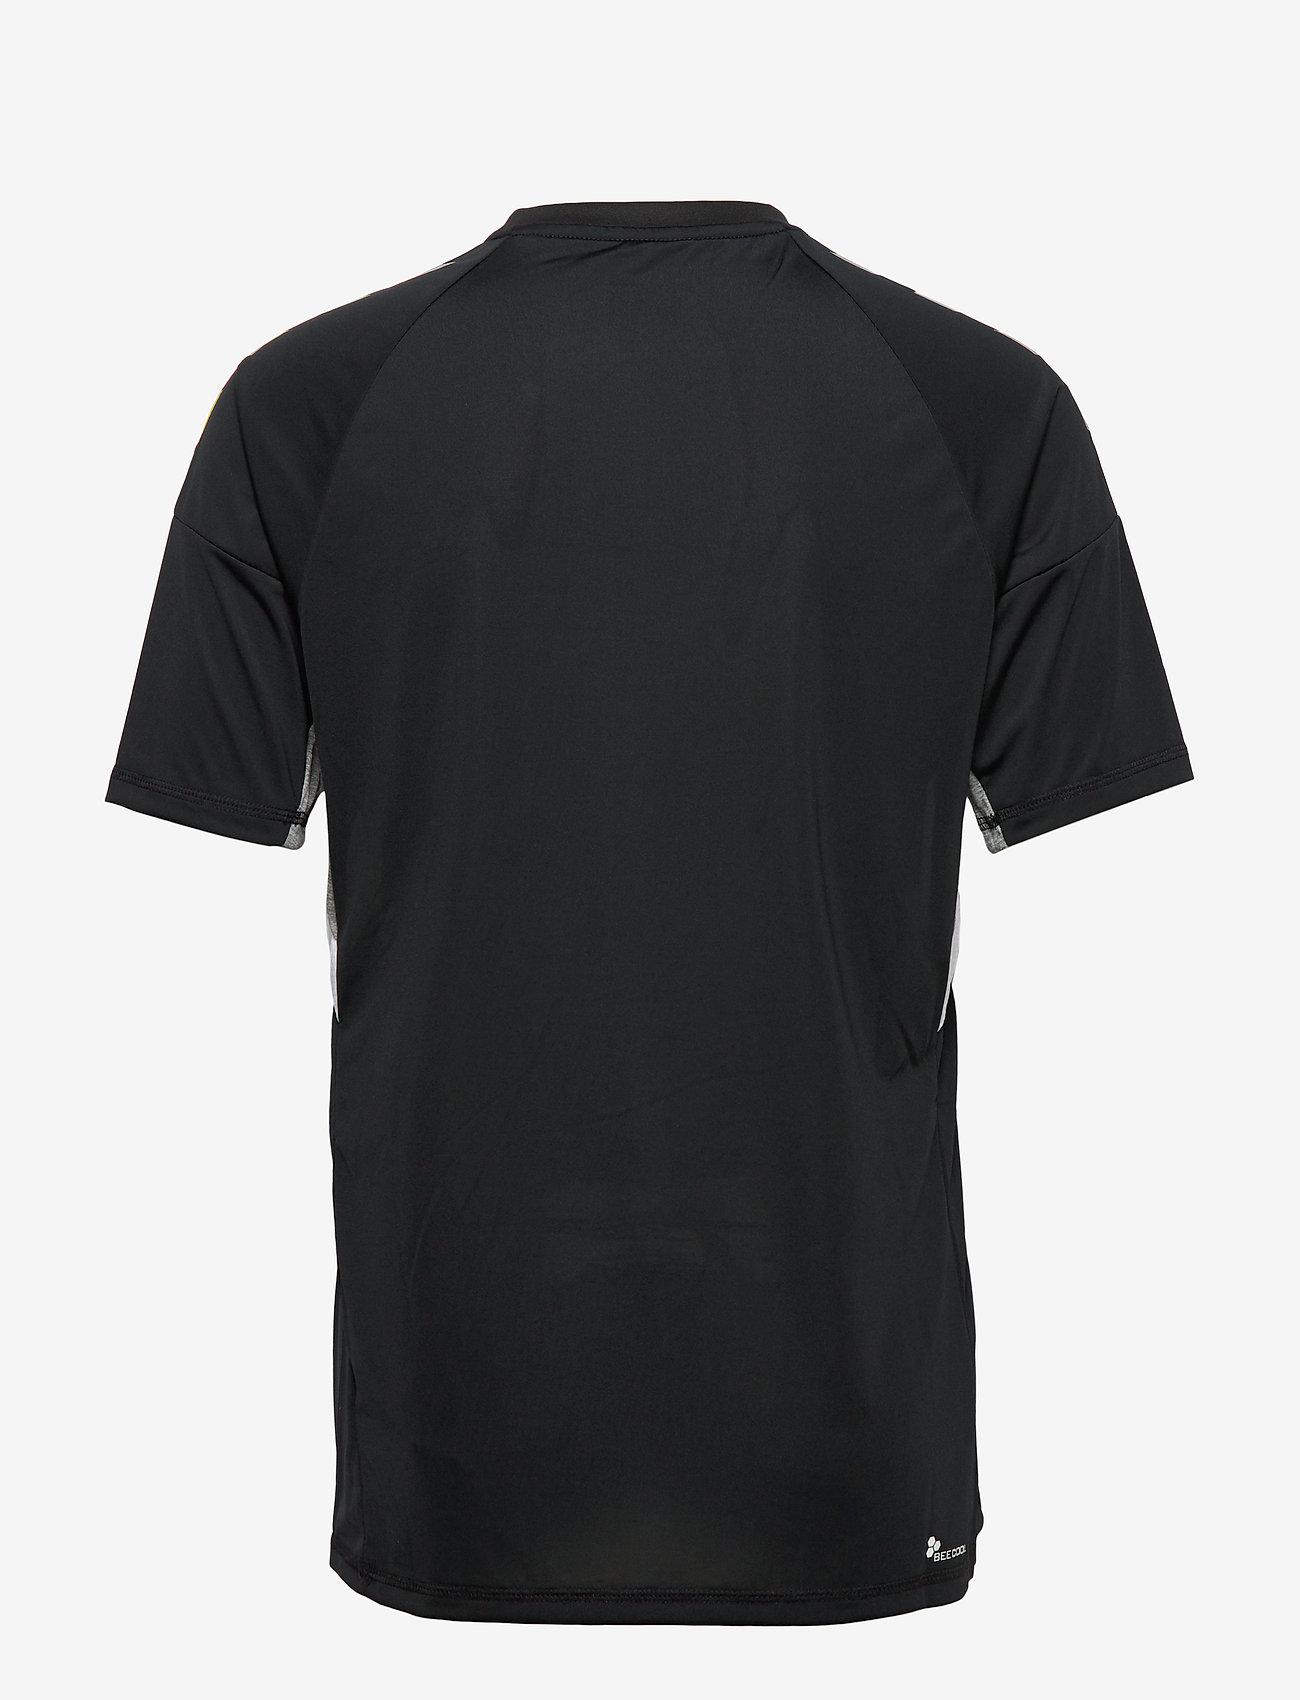 Hummel - TECH MOVE JERSEY S/S - football shirts - black - 1